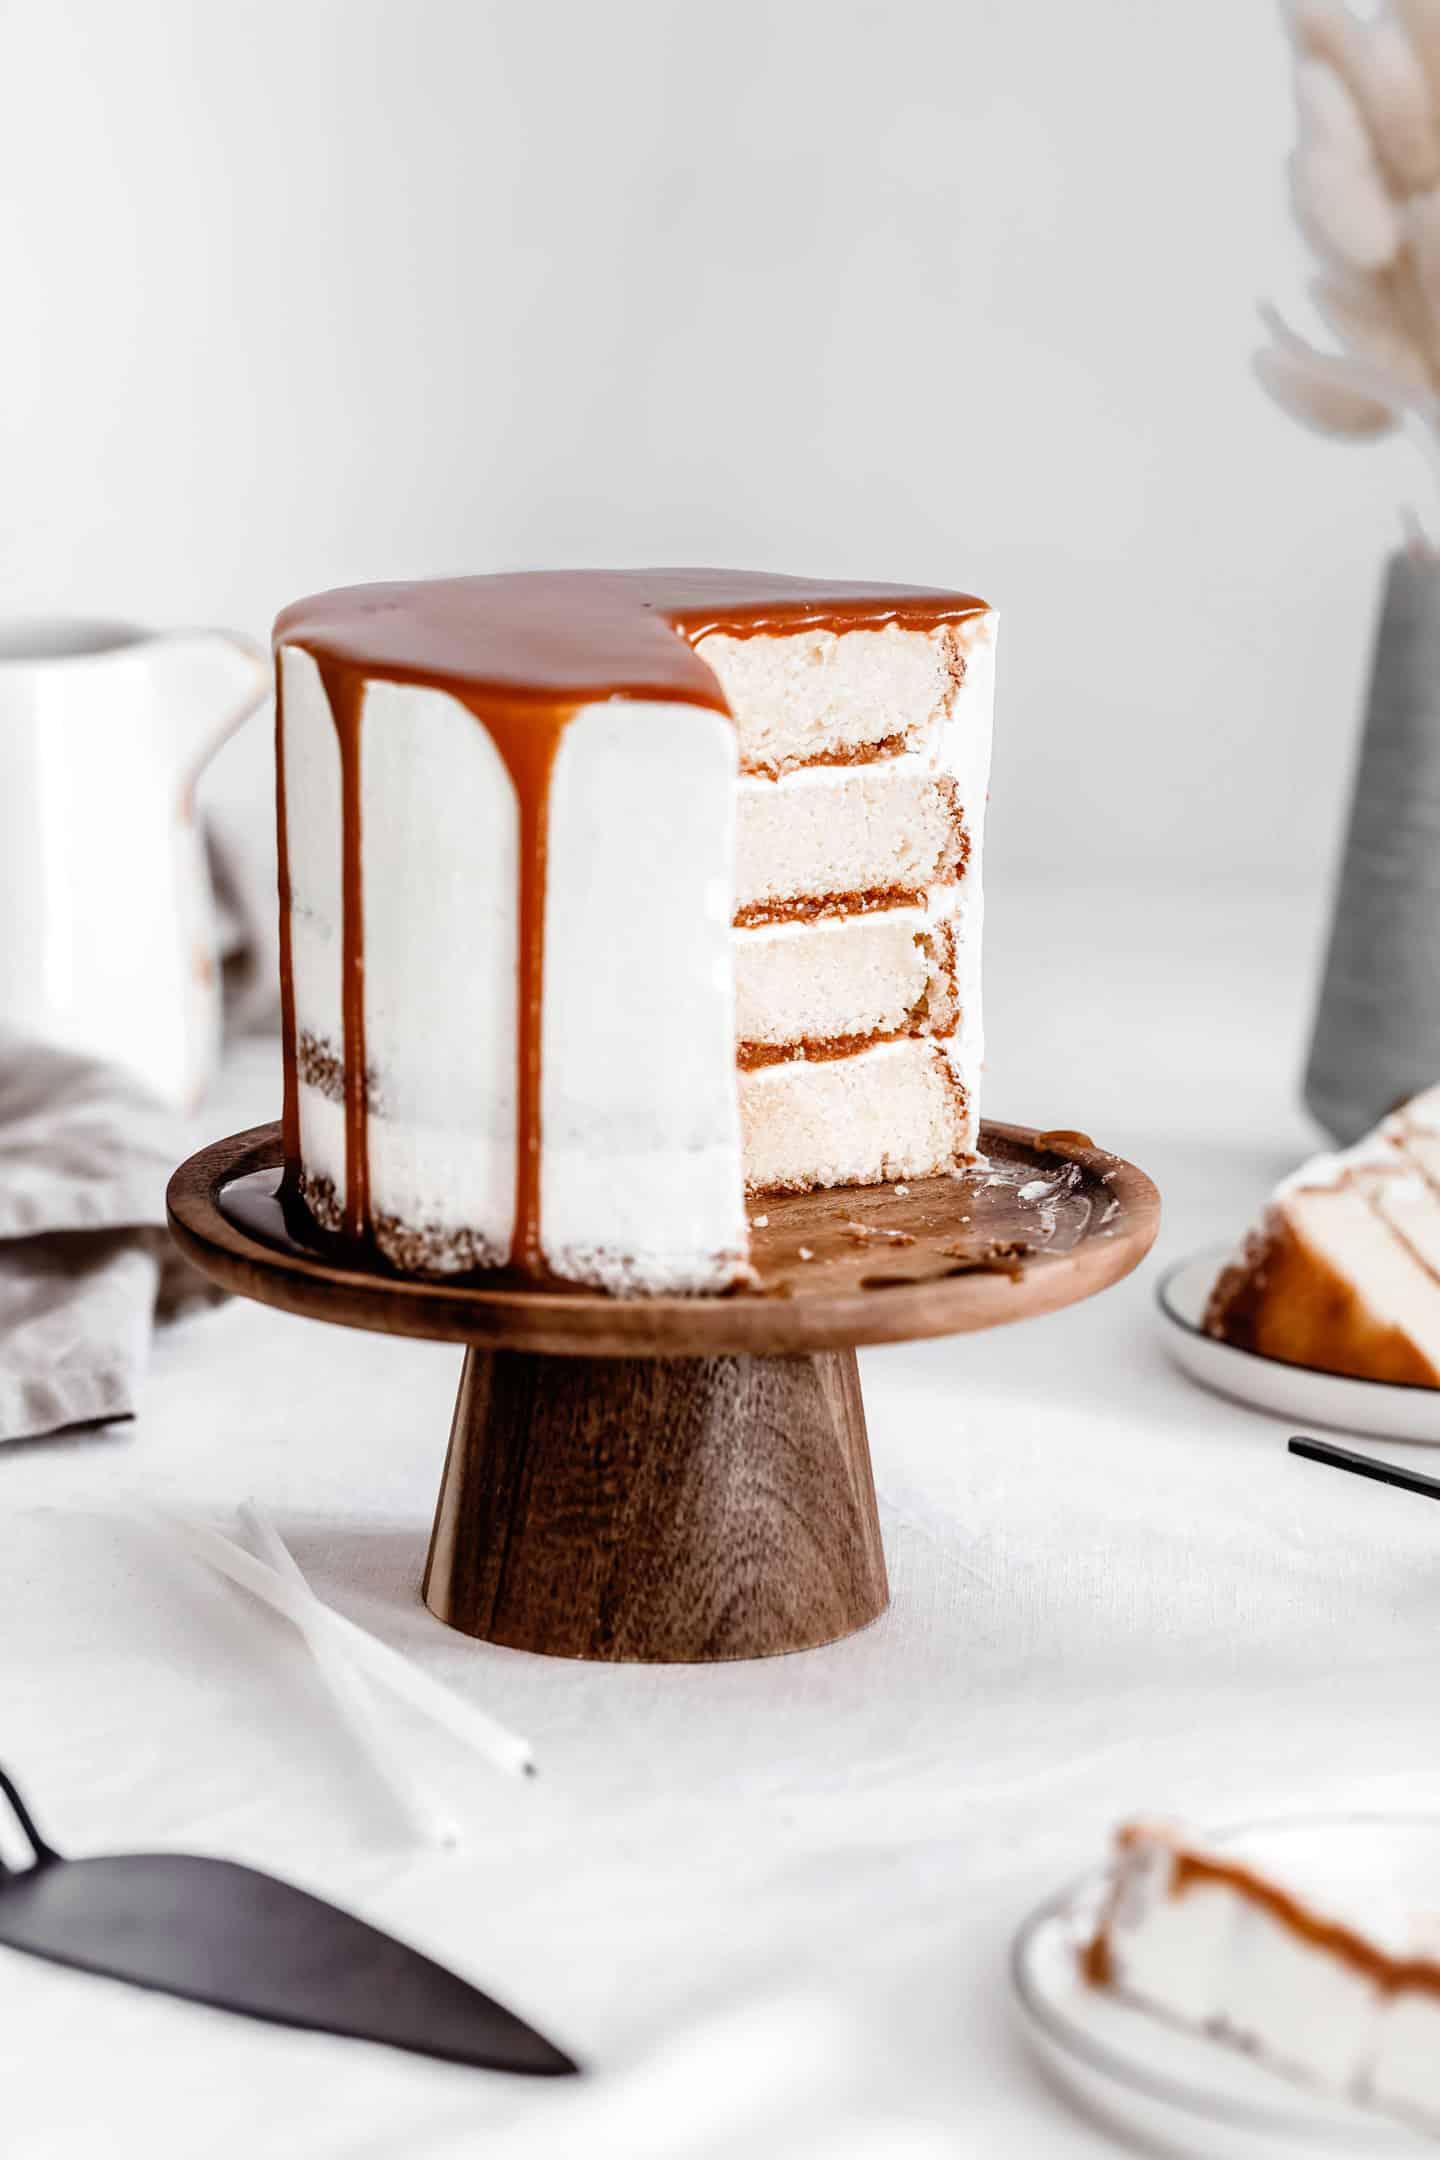 Layer cake vanille et caramel